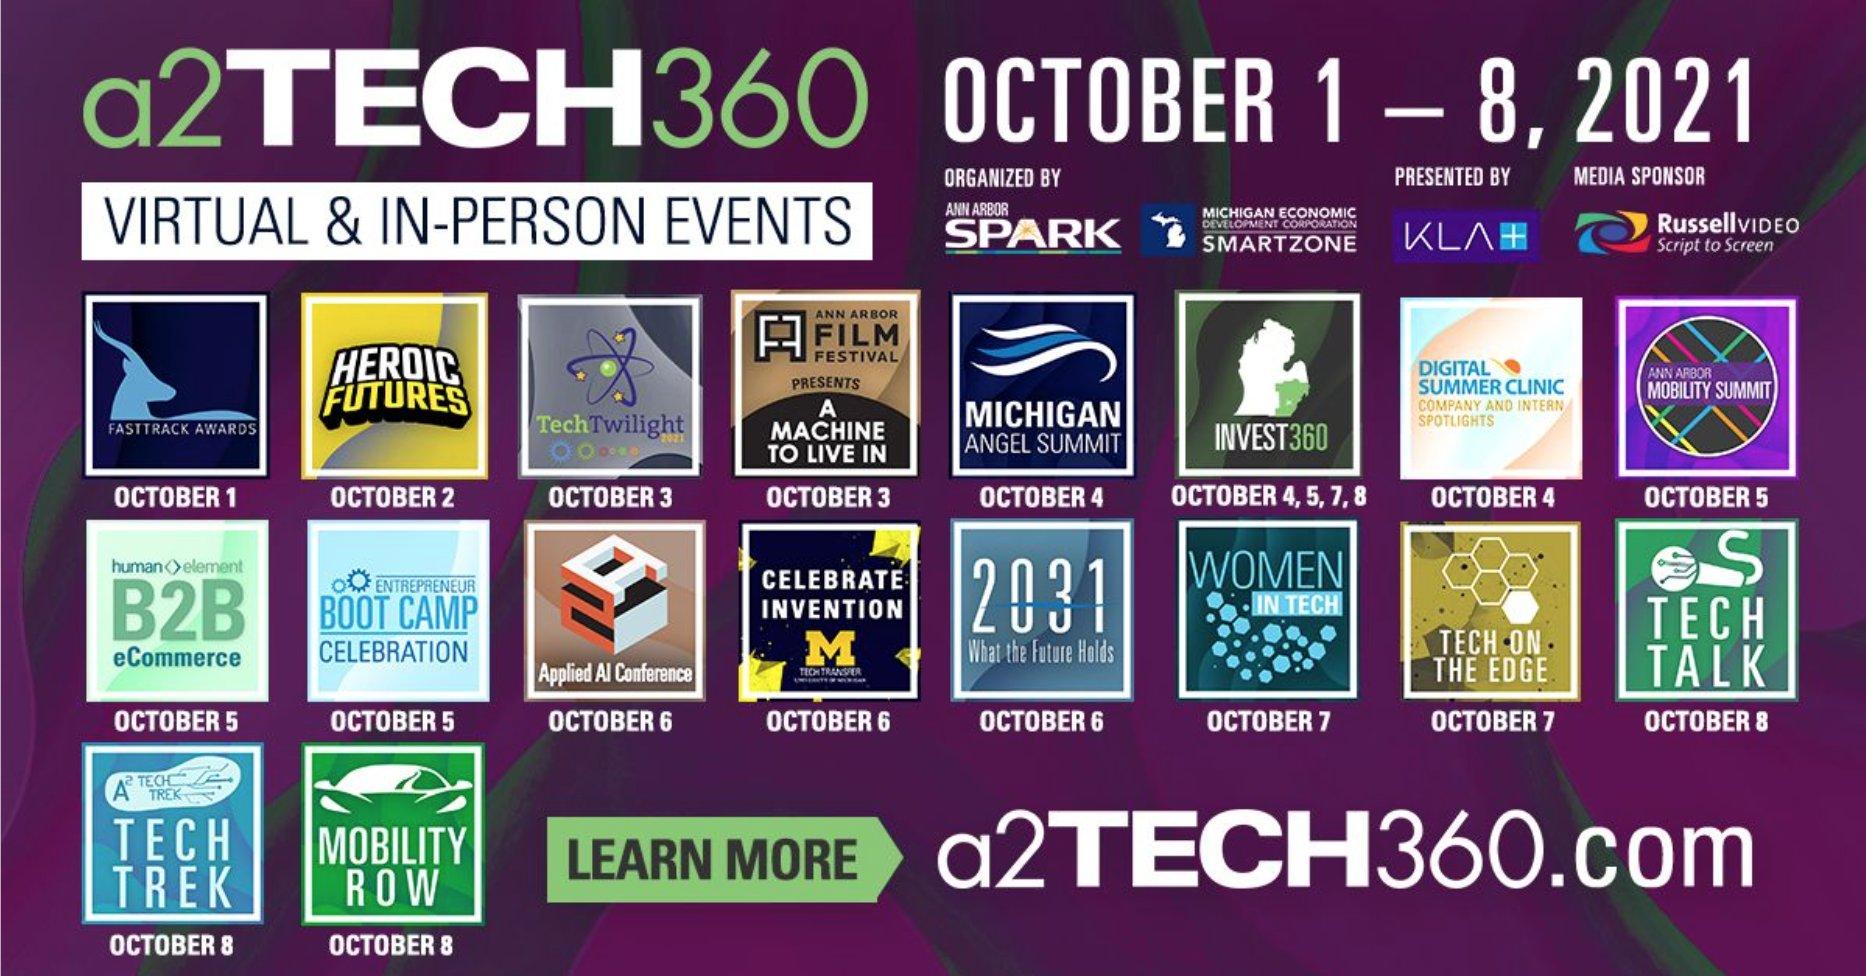 a2tech360-midwest-tech-events